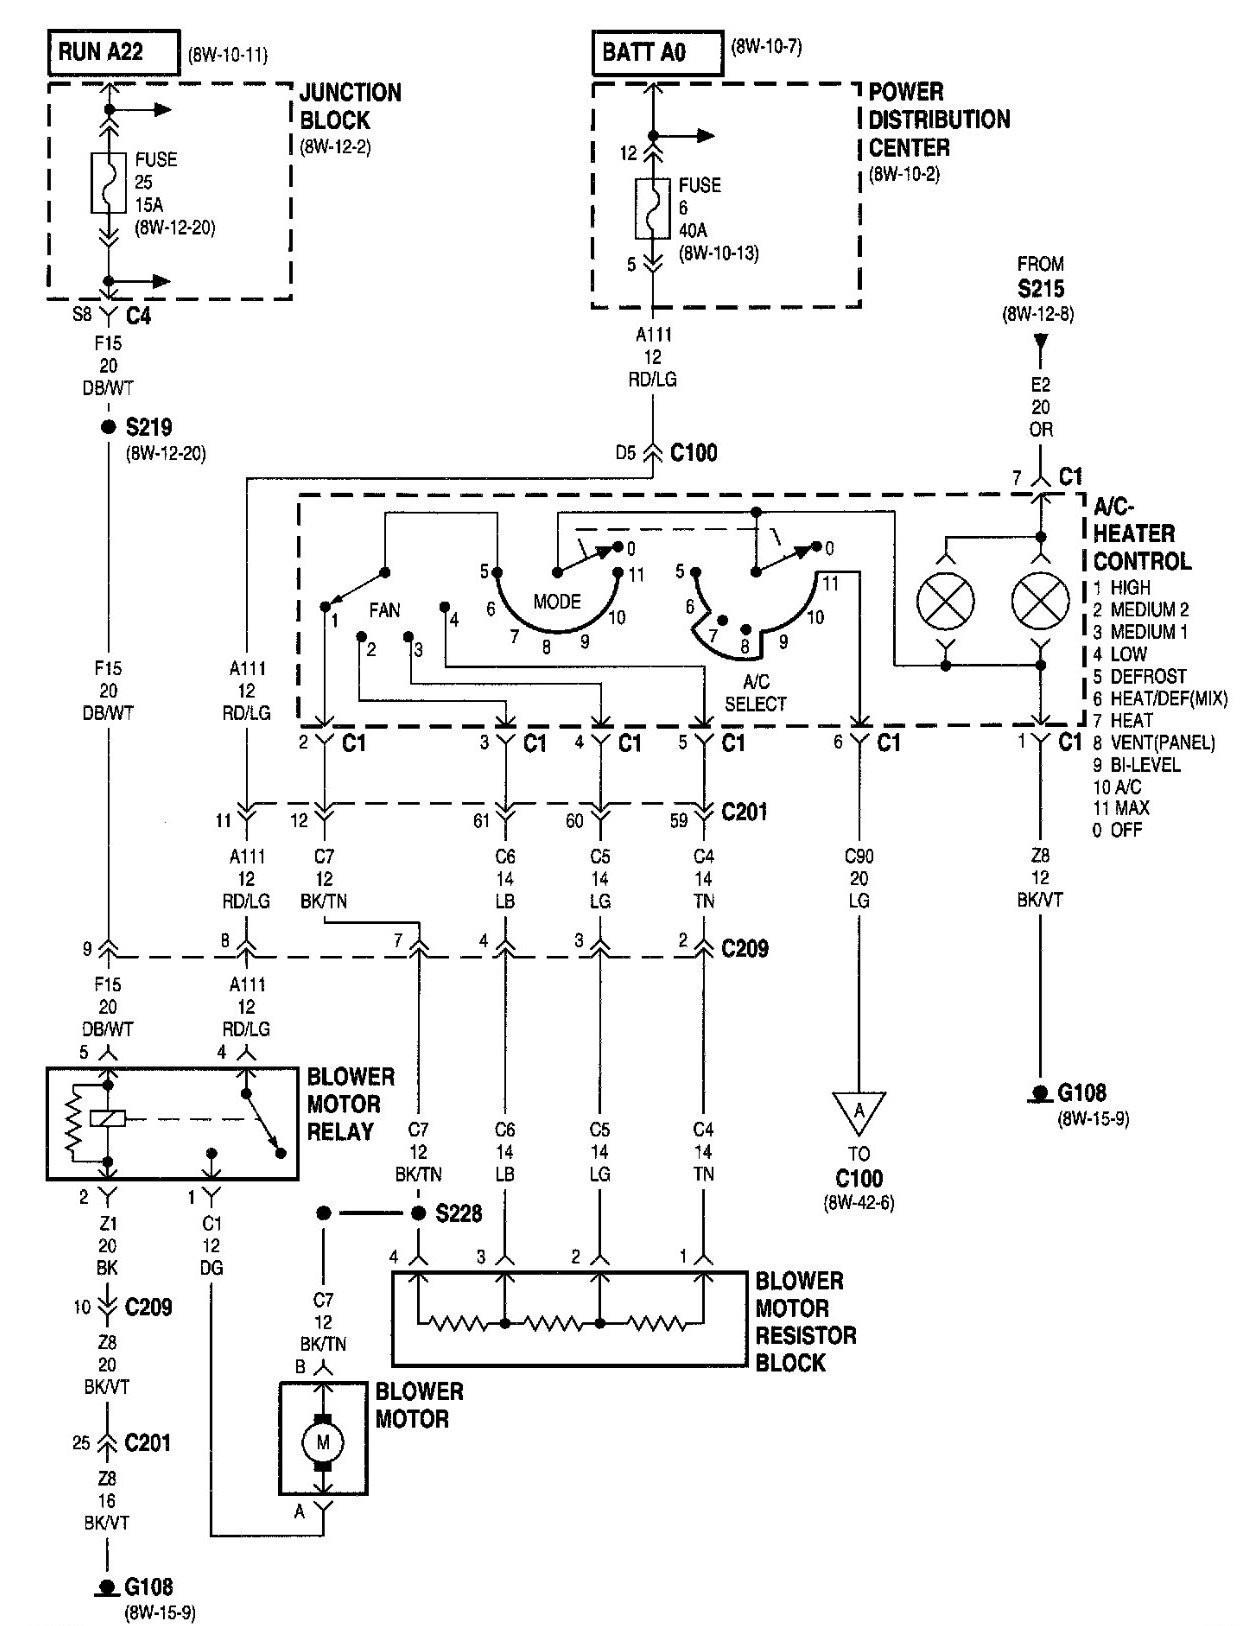 2005 Jeep Grand Cherokee Engine Diagram Wiring Diagram as Well Jeep Grand Cherokee Front Suspension Diagram Of 2005 Jeep Grand Cherokee Engine Diagram